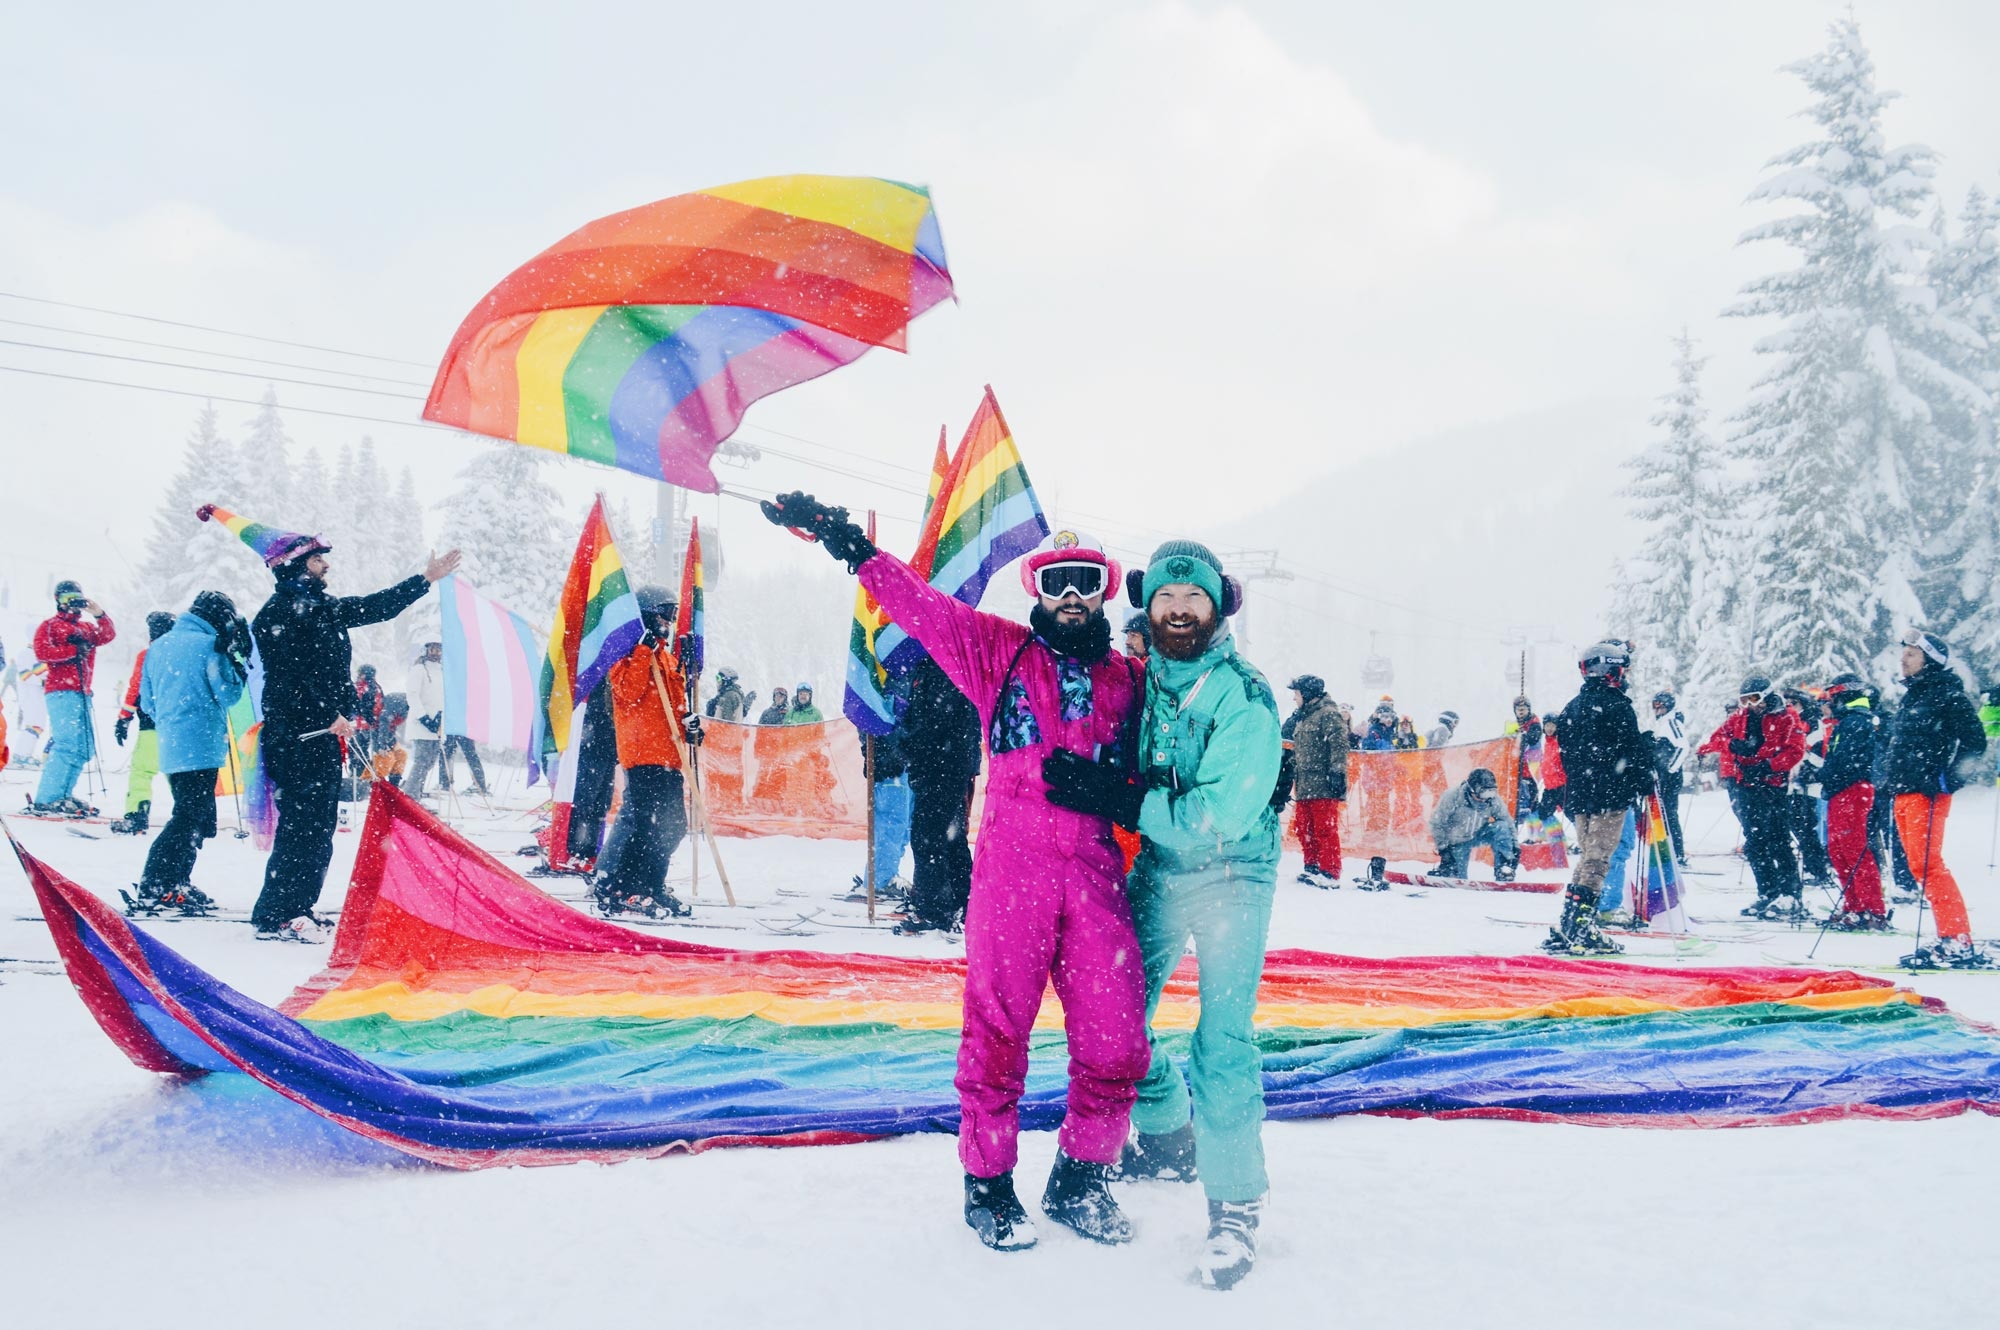 Whistler Pride & Ski Festival | Whistler Pride 2018 Gay Ski Week © CoupleofMen.com